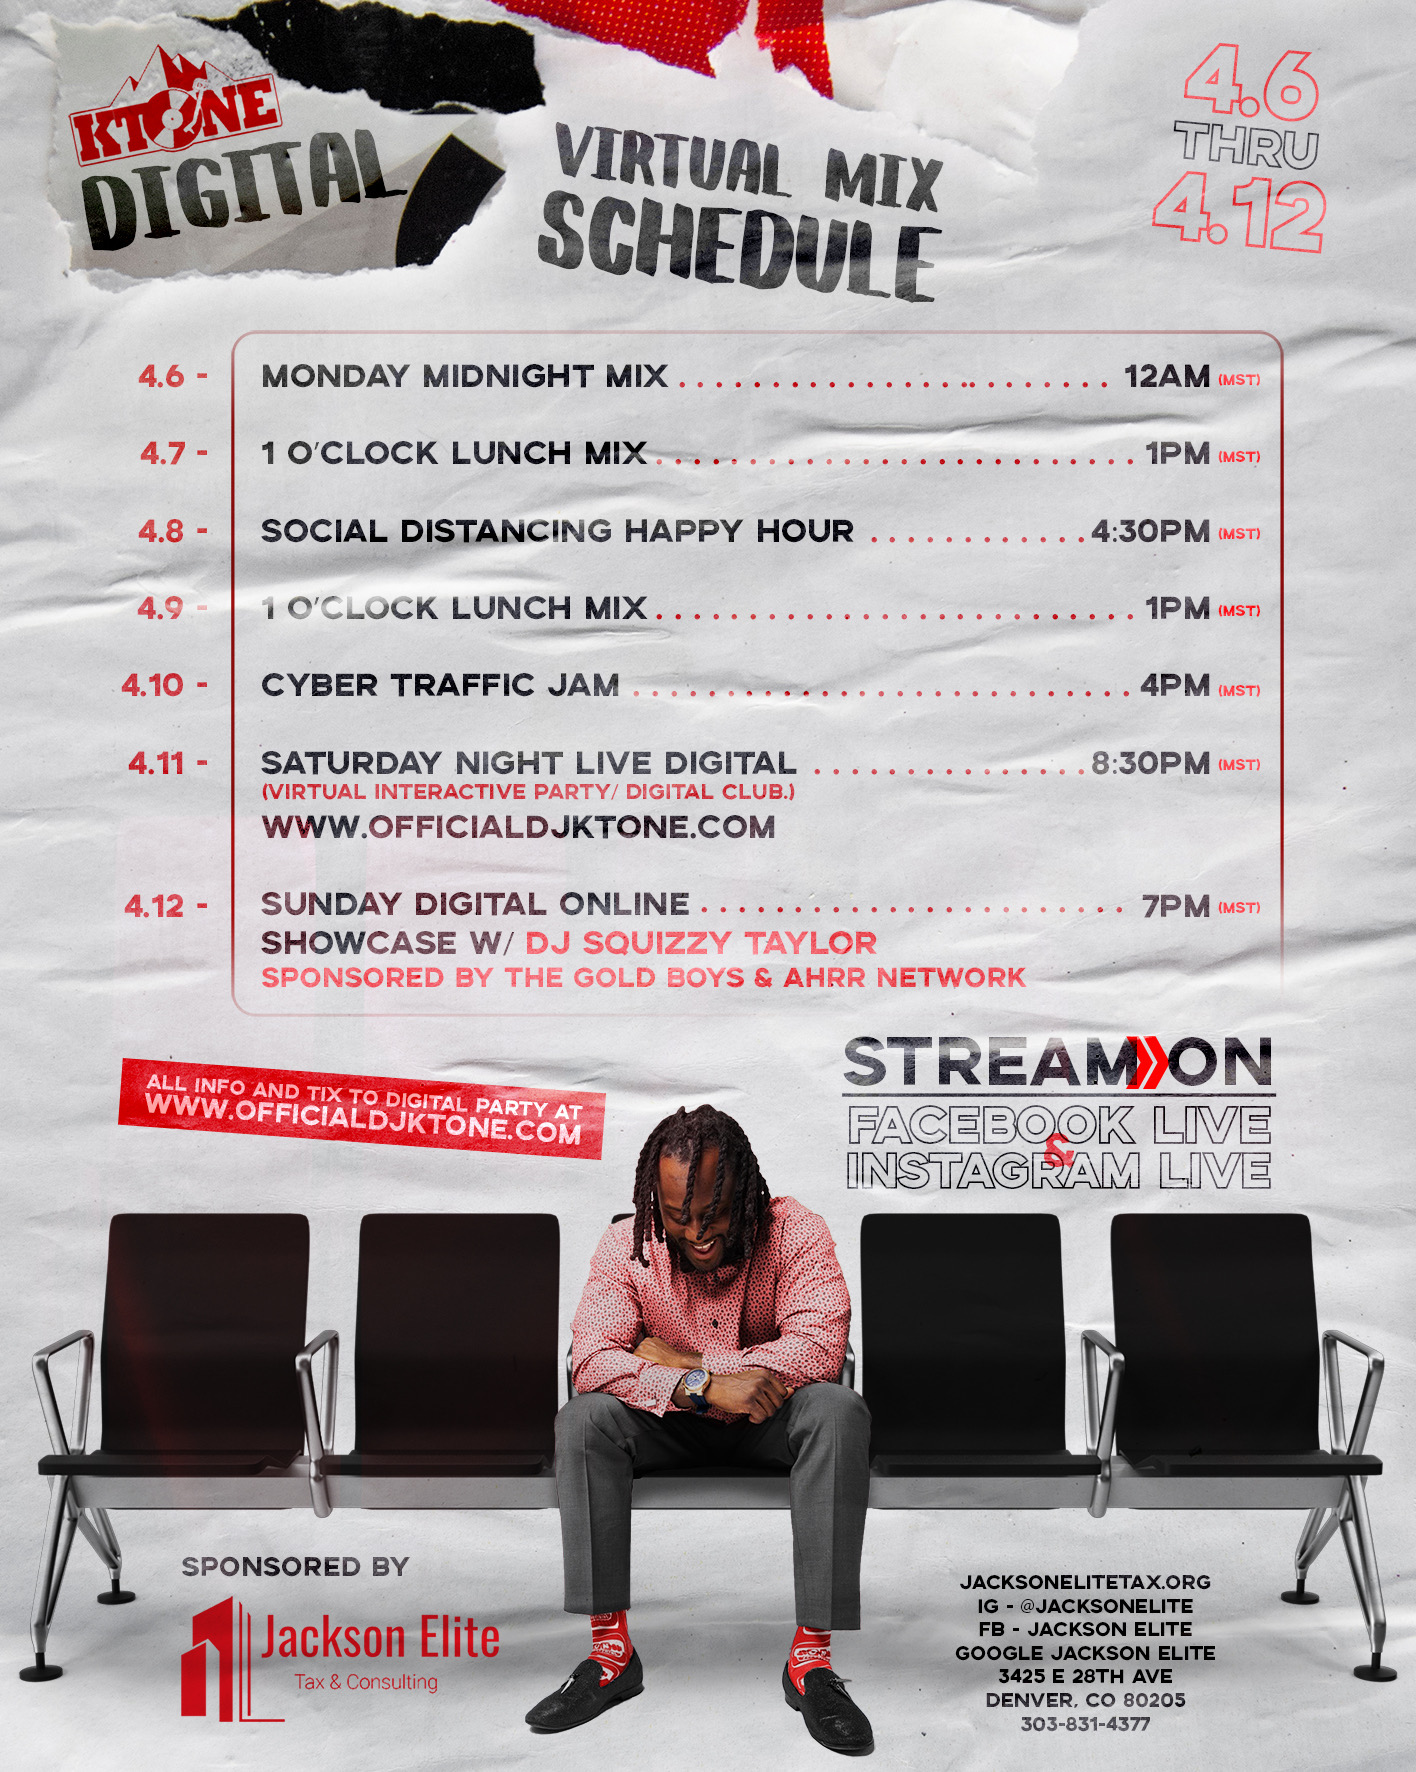 Dj Ktone digital schedule April 2020